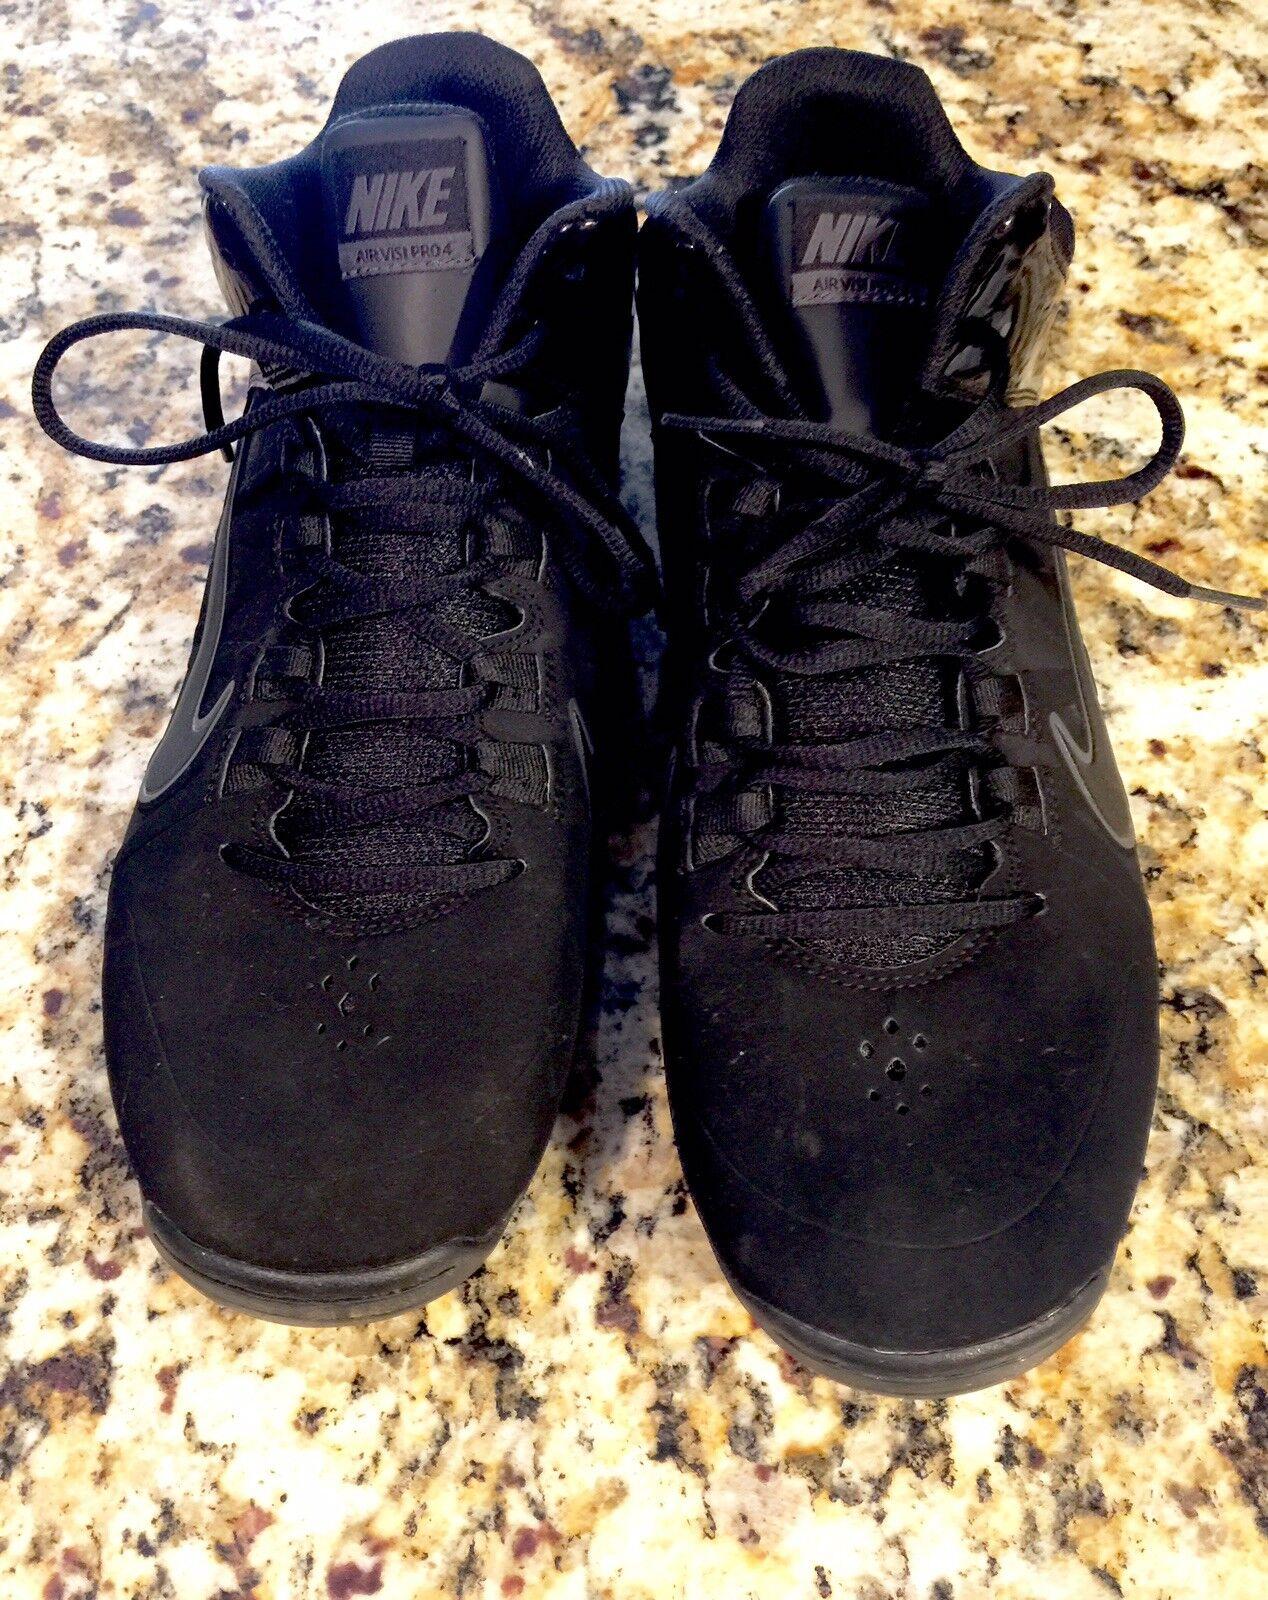 Nike air visita pro iv scarpe uomini scarpe iv da basket 599569-012 dimensioni 13 fdaf12